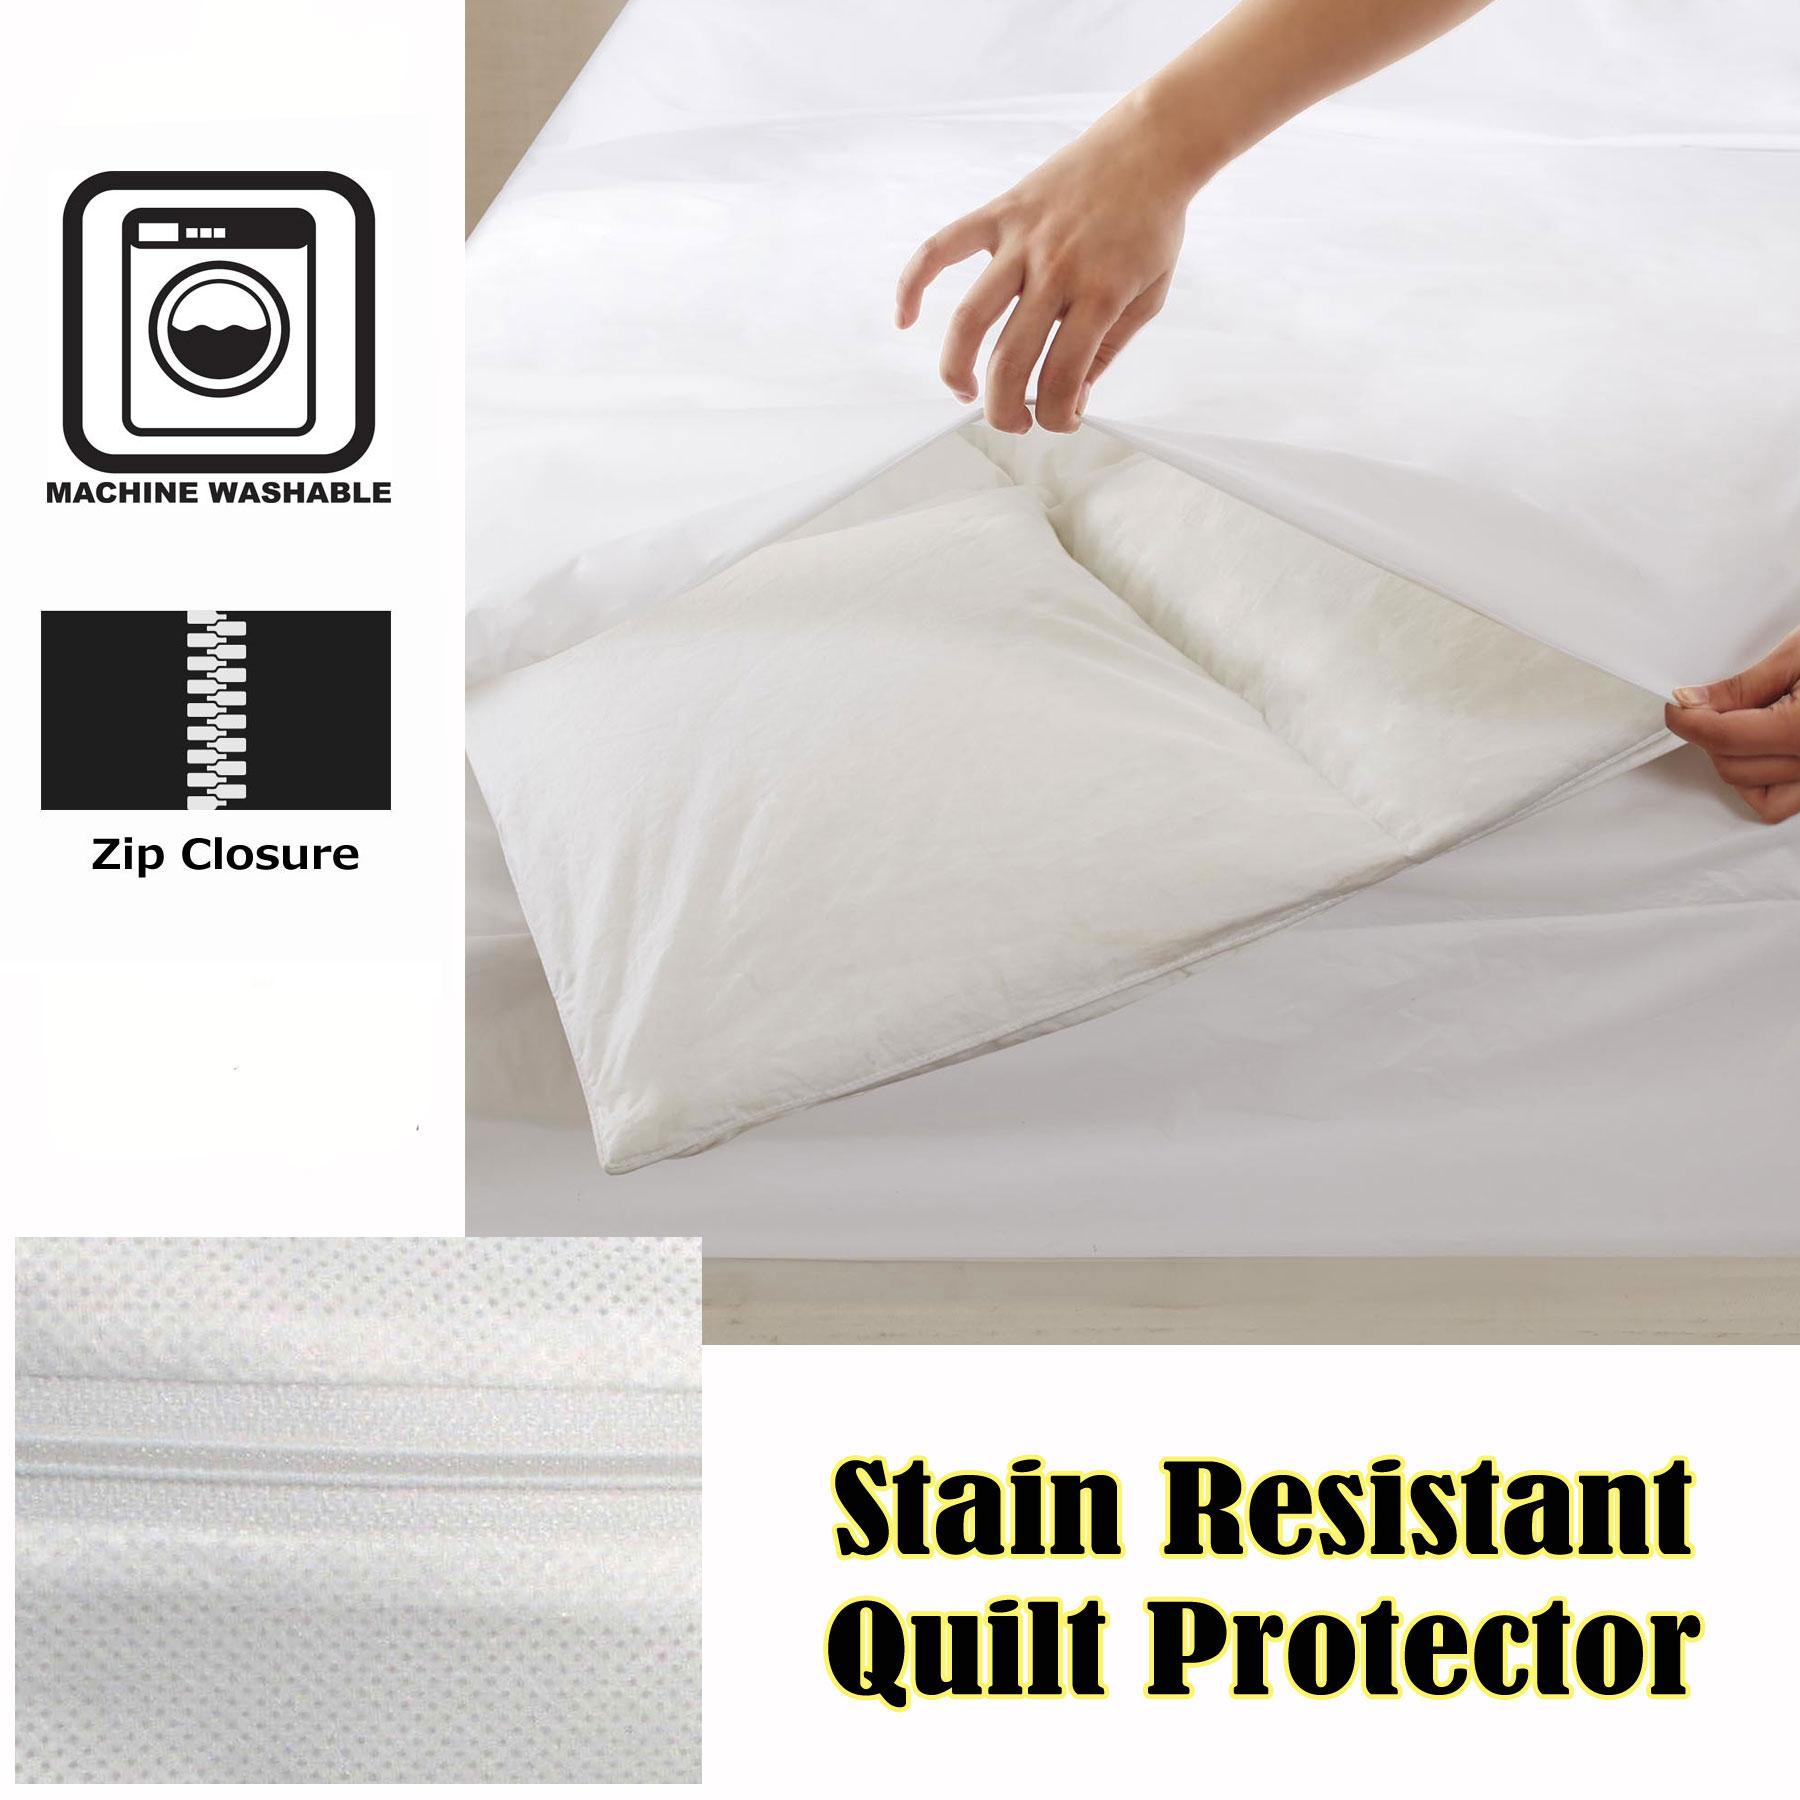 protector protectors mattress pillows drylife inner homewares bedroom waterproof duvet and